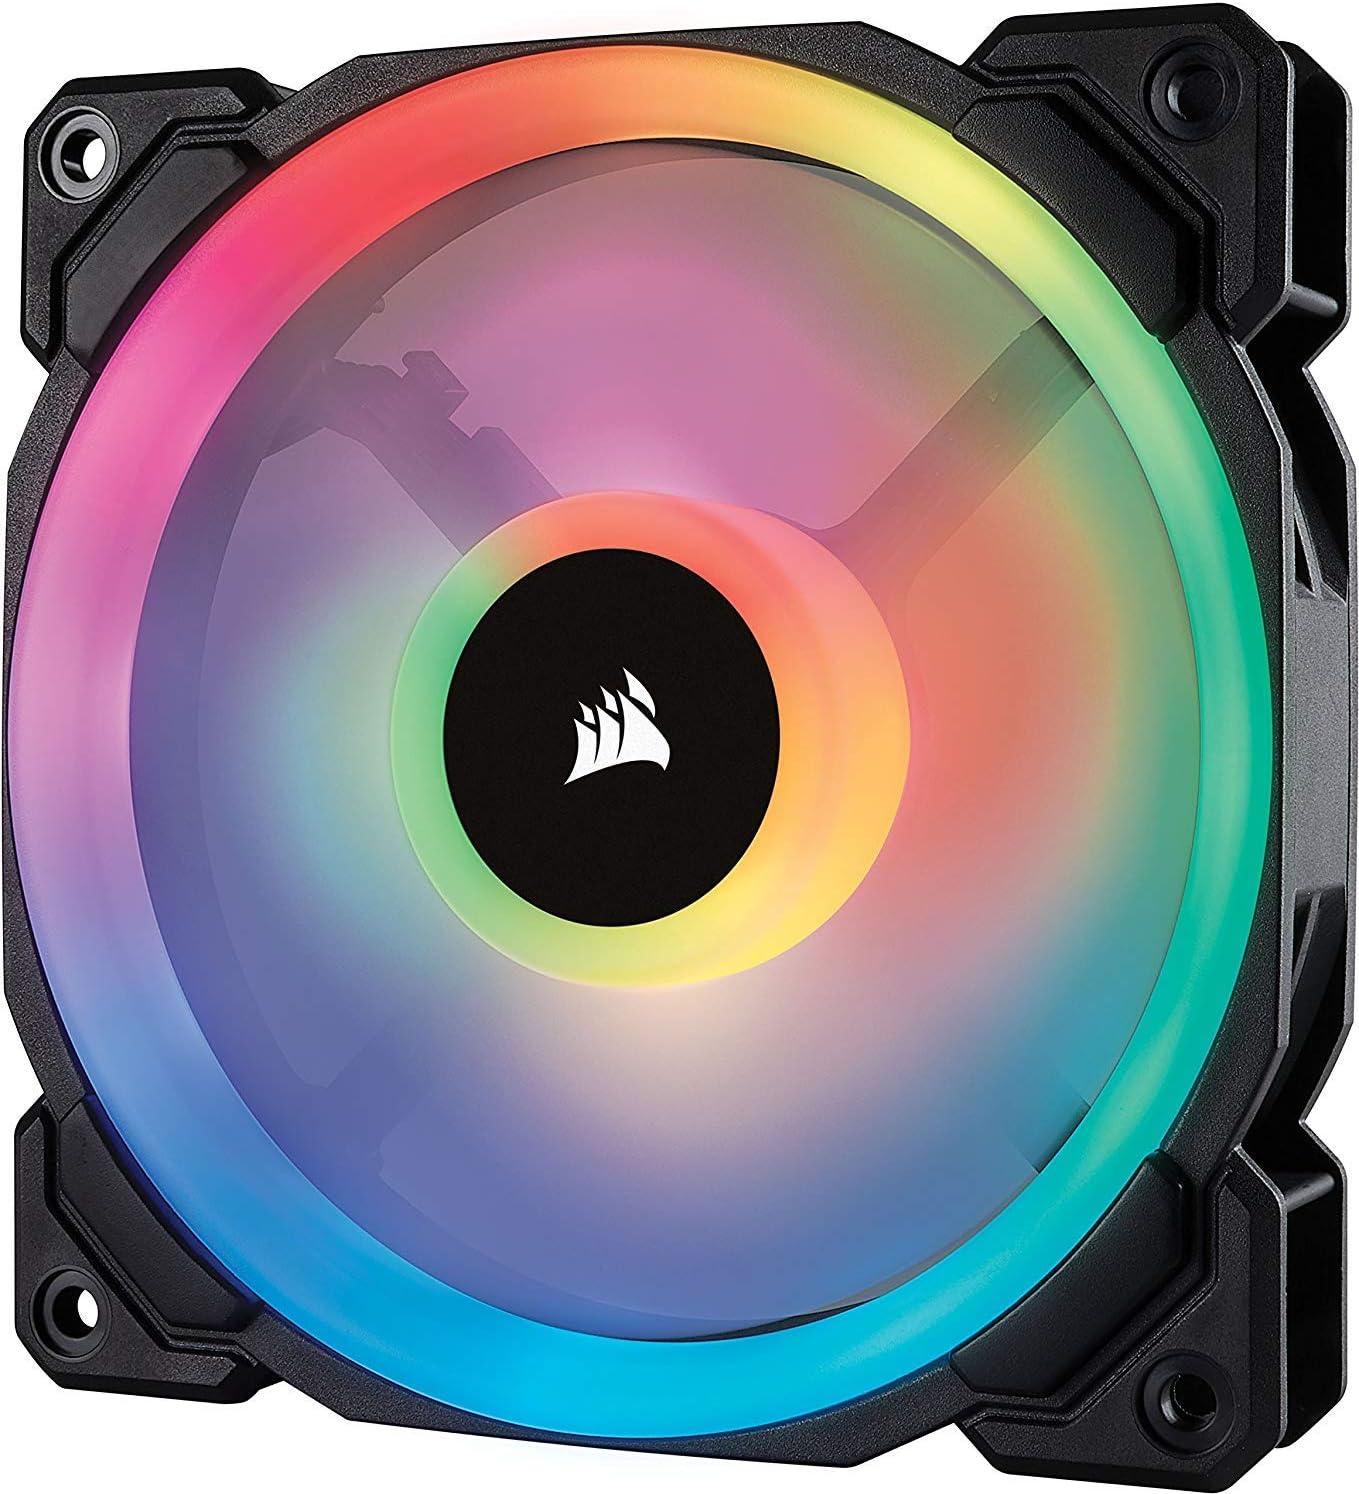 Corsair LL Series LL120 RGB 120mm Dual Light Loop RGB LED PWM Fan Single Pack $28.19  Coupon